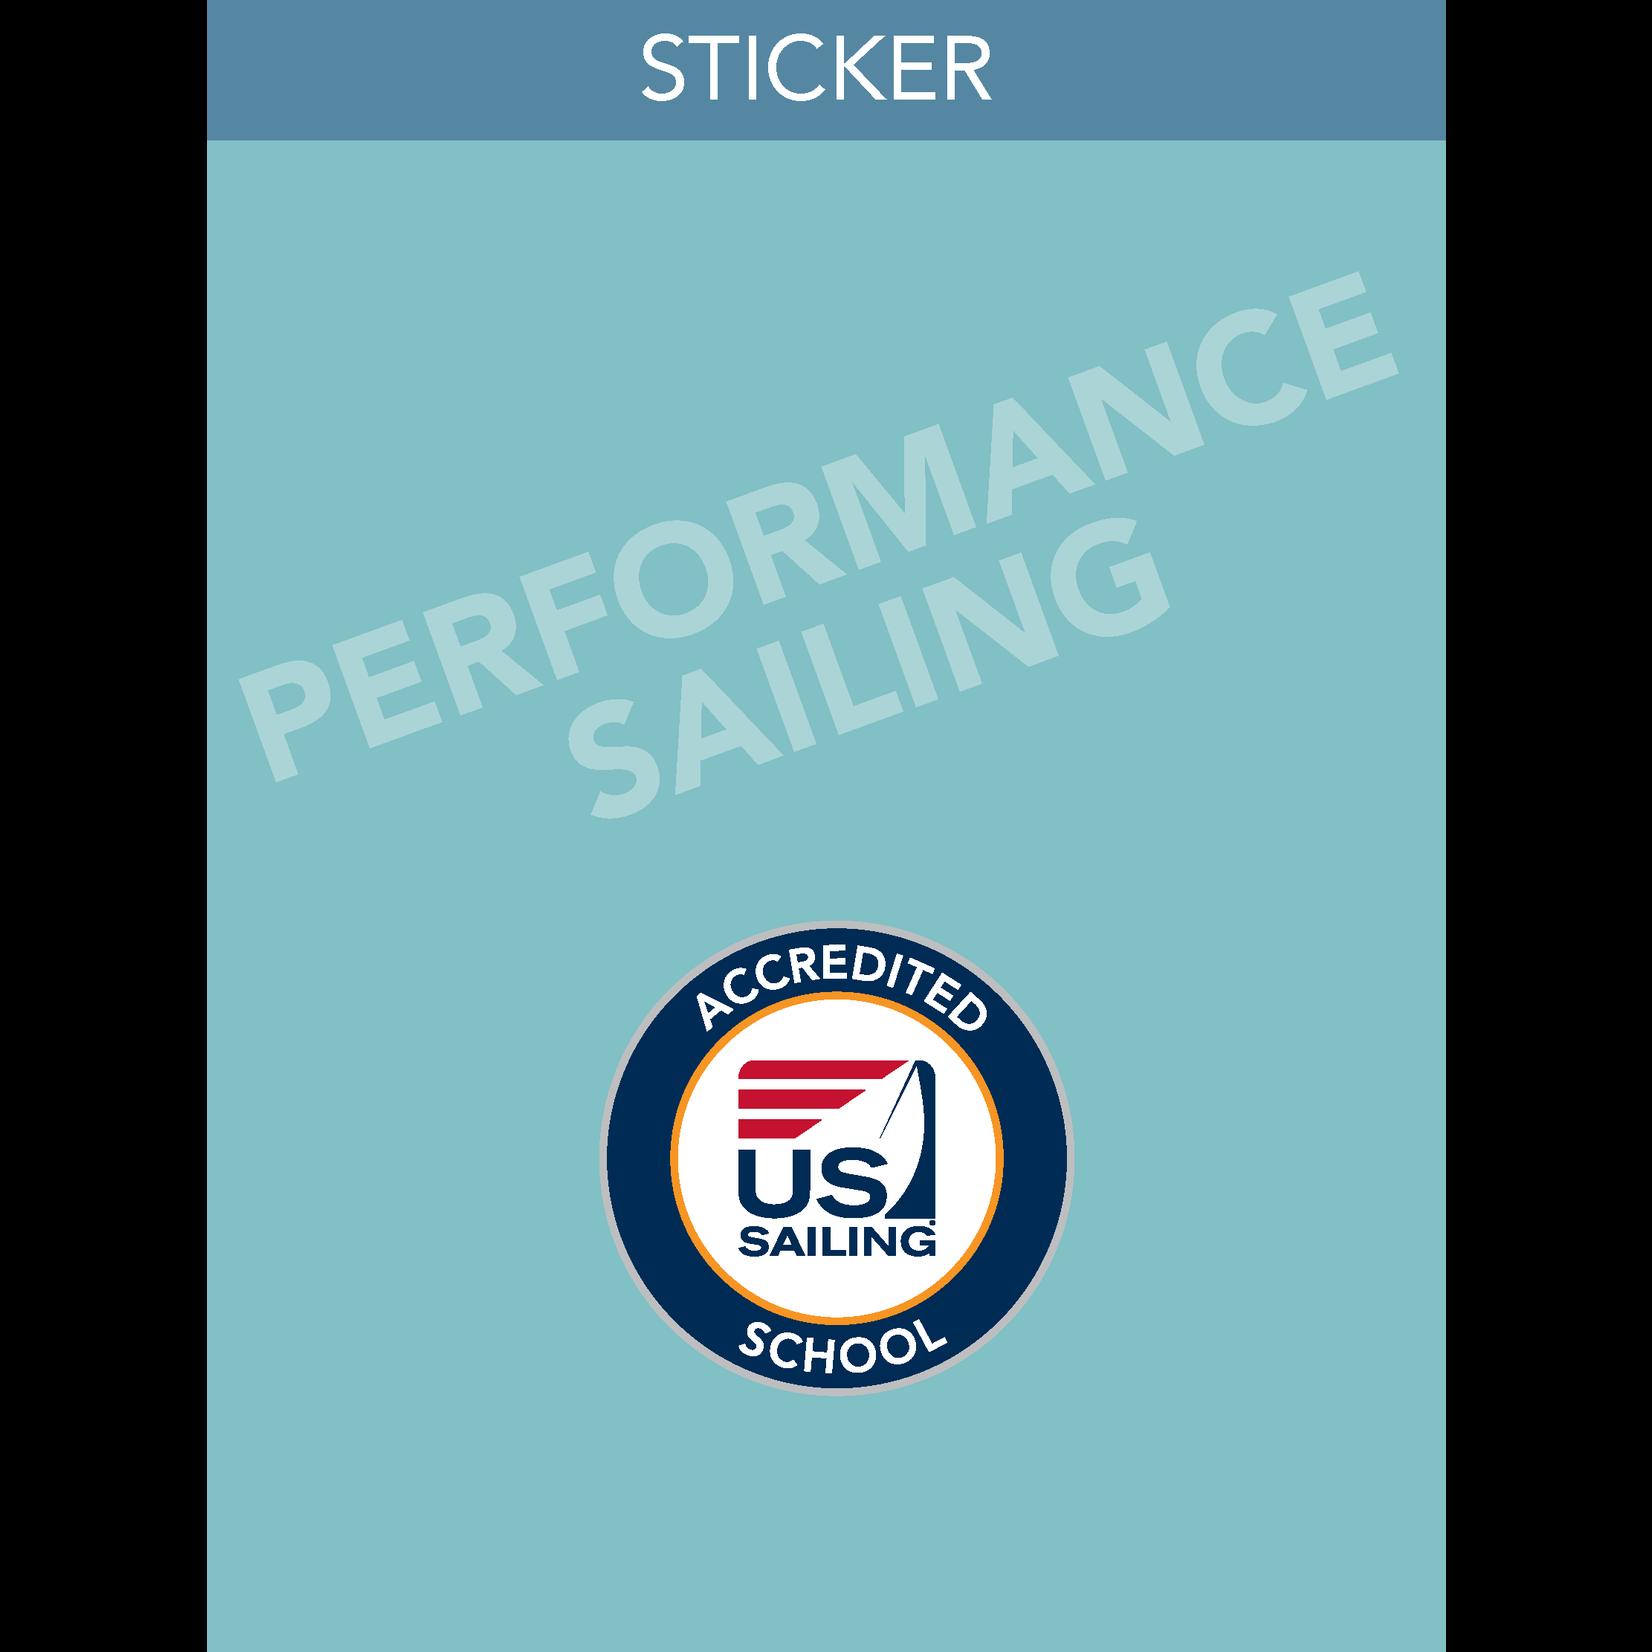 Performance Sailing Endorsement Sticker